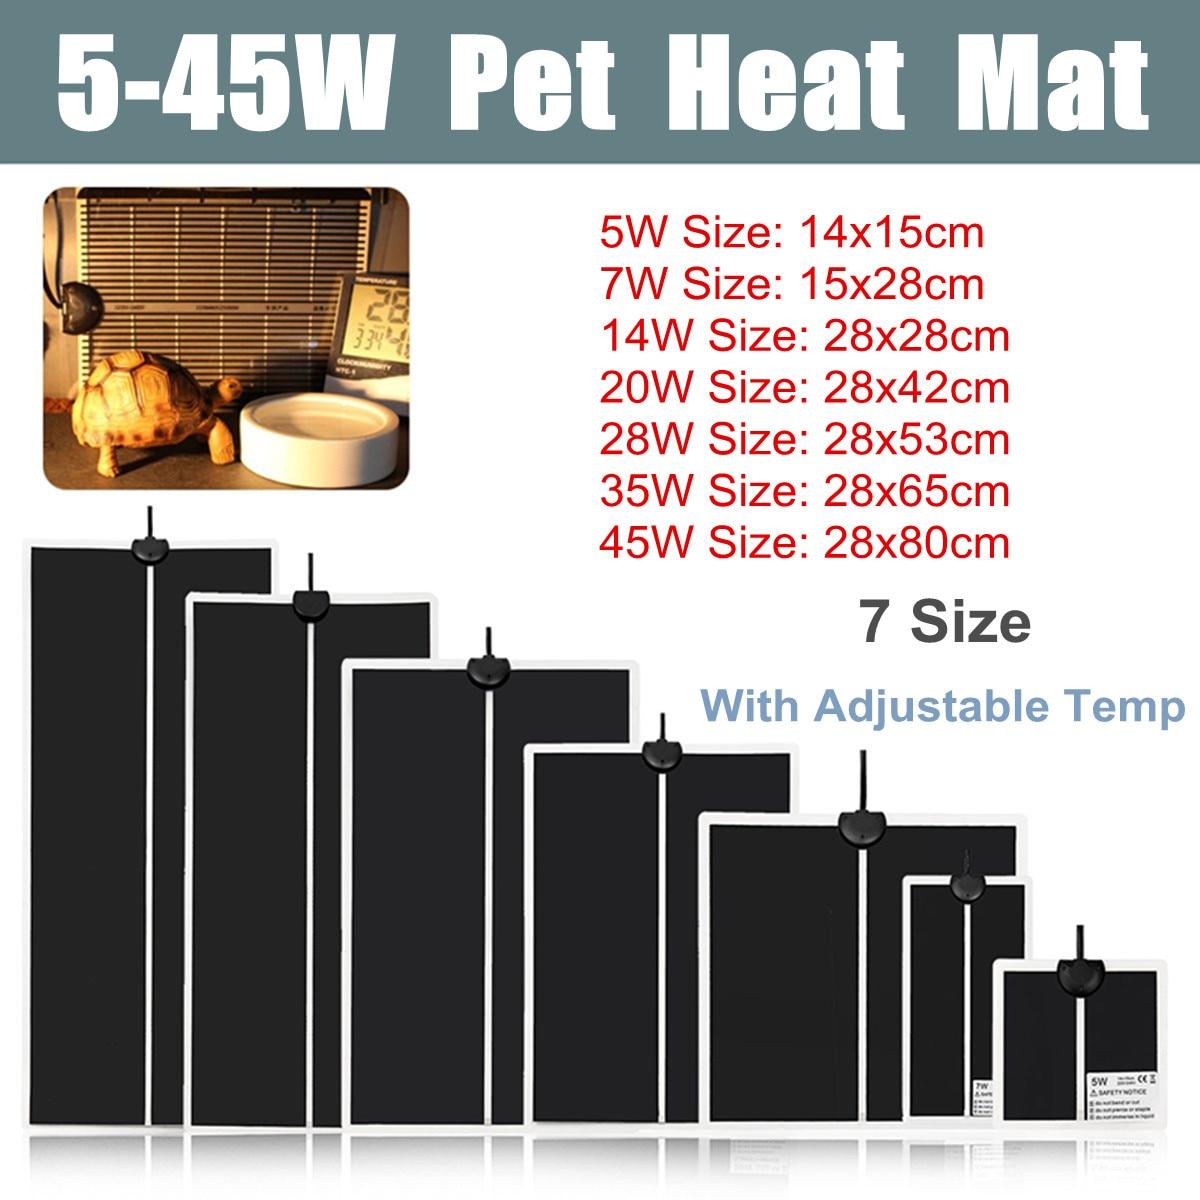 5-45W Terrarium Reptiles Heat Mat Climbing Pet Heating Warm Pads Adjustable Temperature Controller Mats Reptiles Supplies